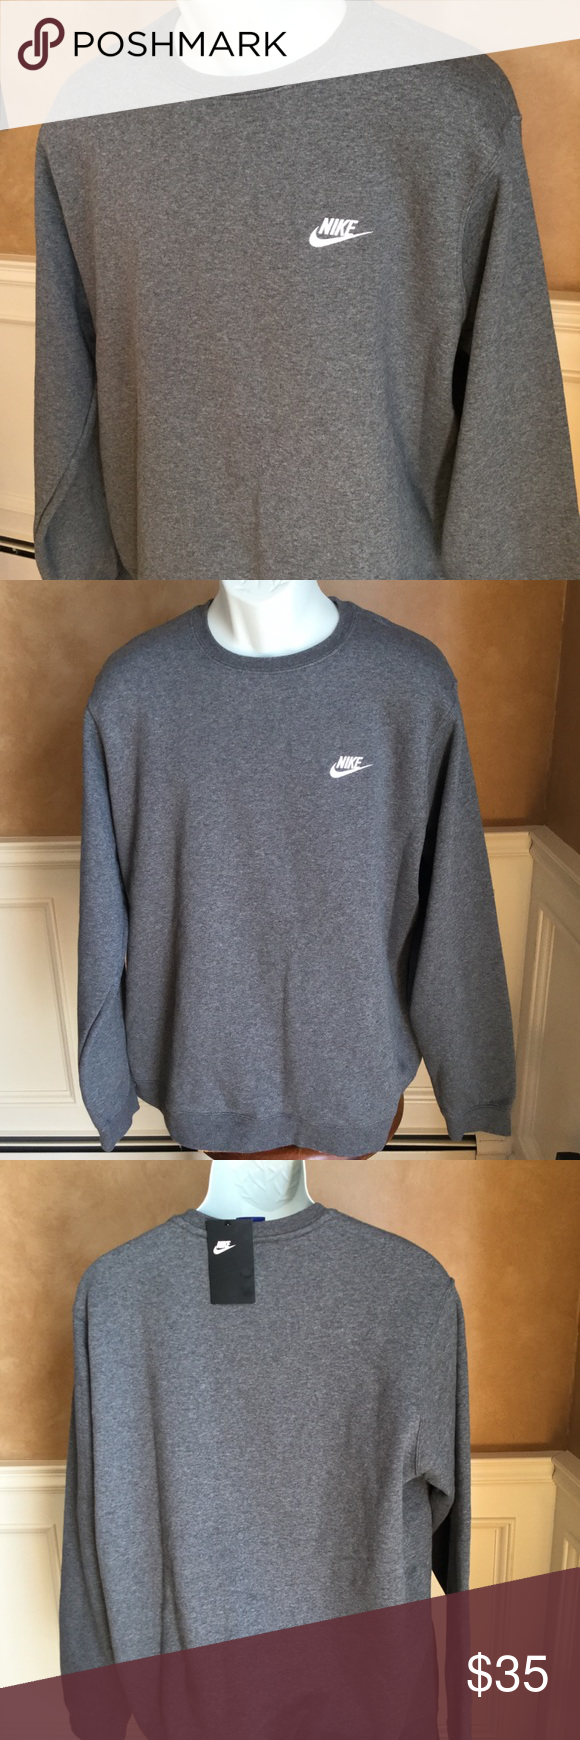 Mens Nike Club Crew Neck Fleece Nike Men Clothes Design Sweatshirt Shirt [ 1740 x 580 Pixel ]